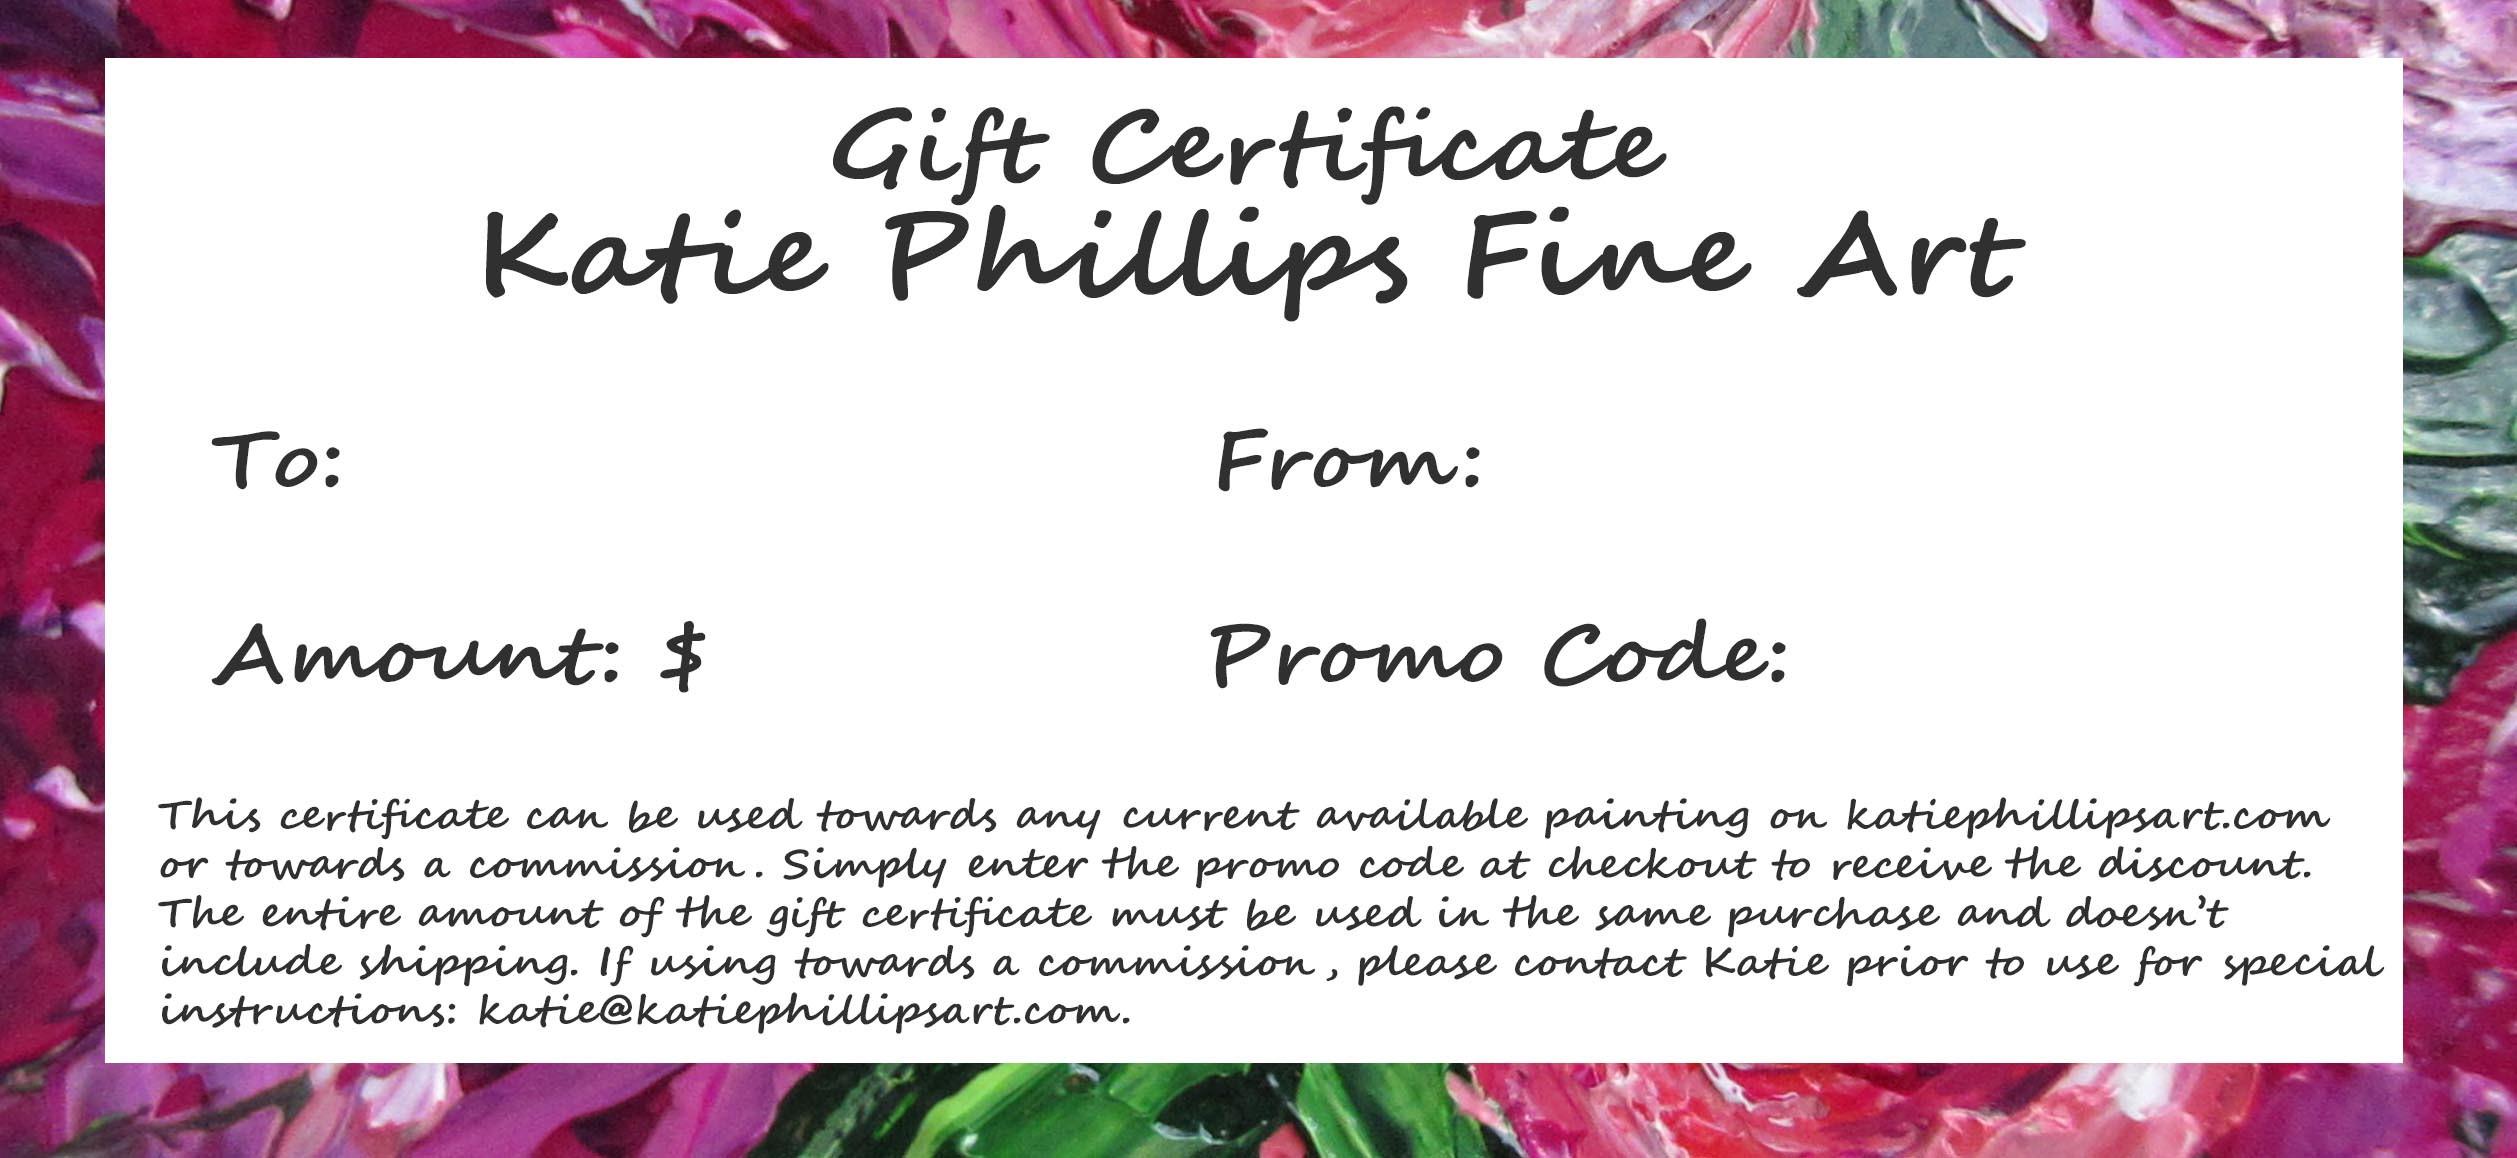 Katie phillips atlanta palette knife artist order gift certificates xflitez Gallery